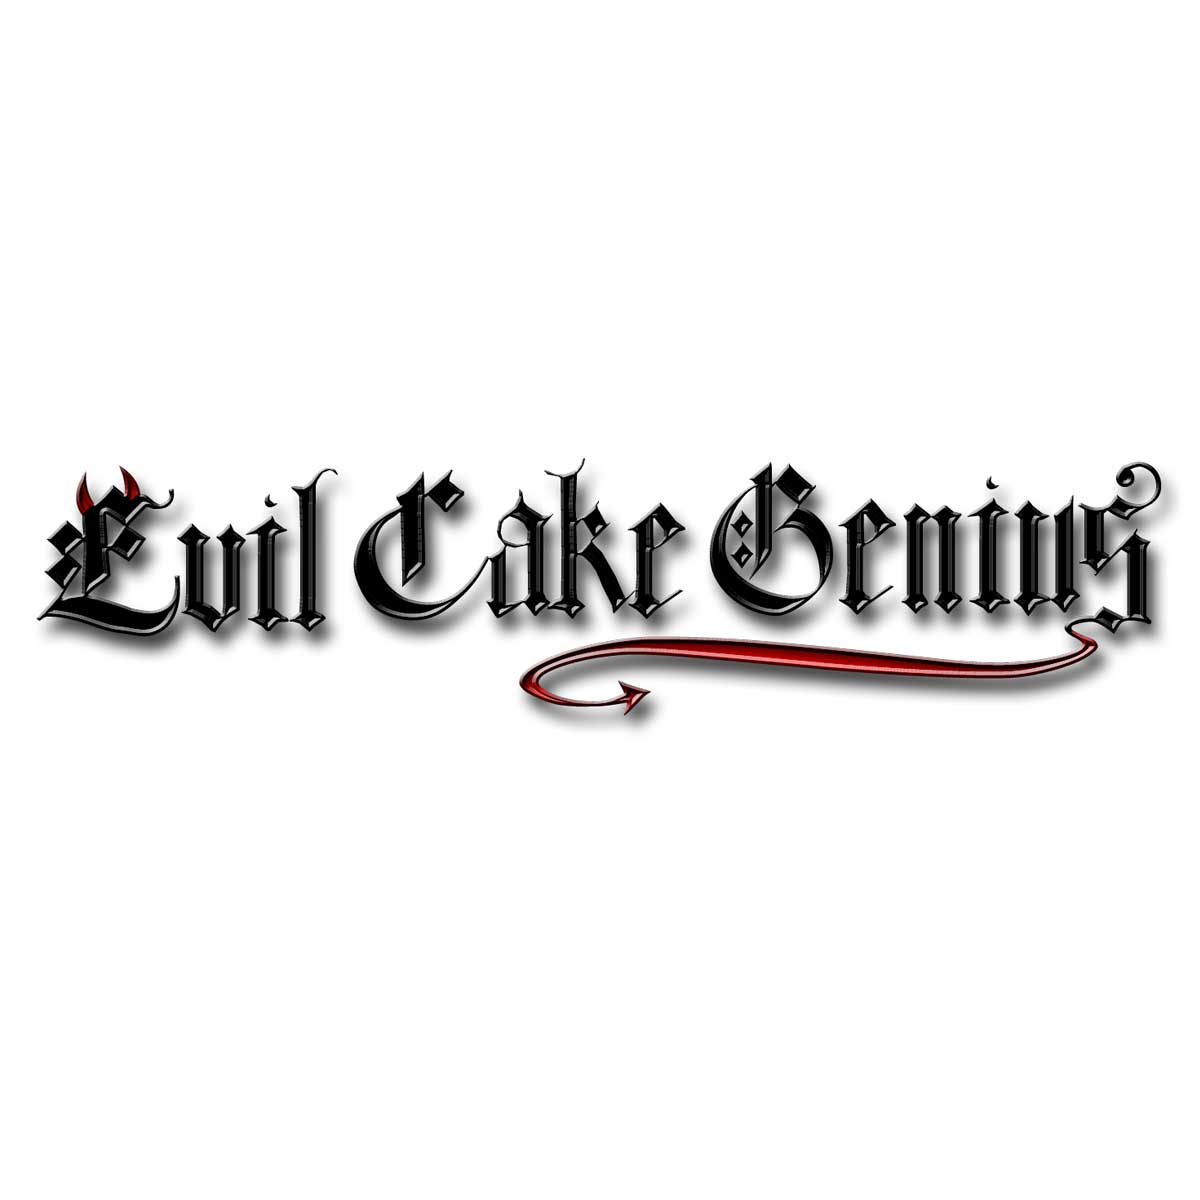 Rose Gold Cake Flakes 10 Grams - Evil Cake Genius